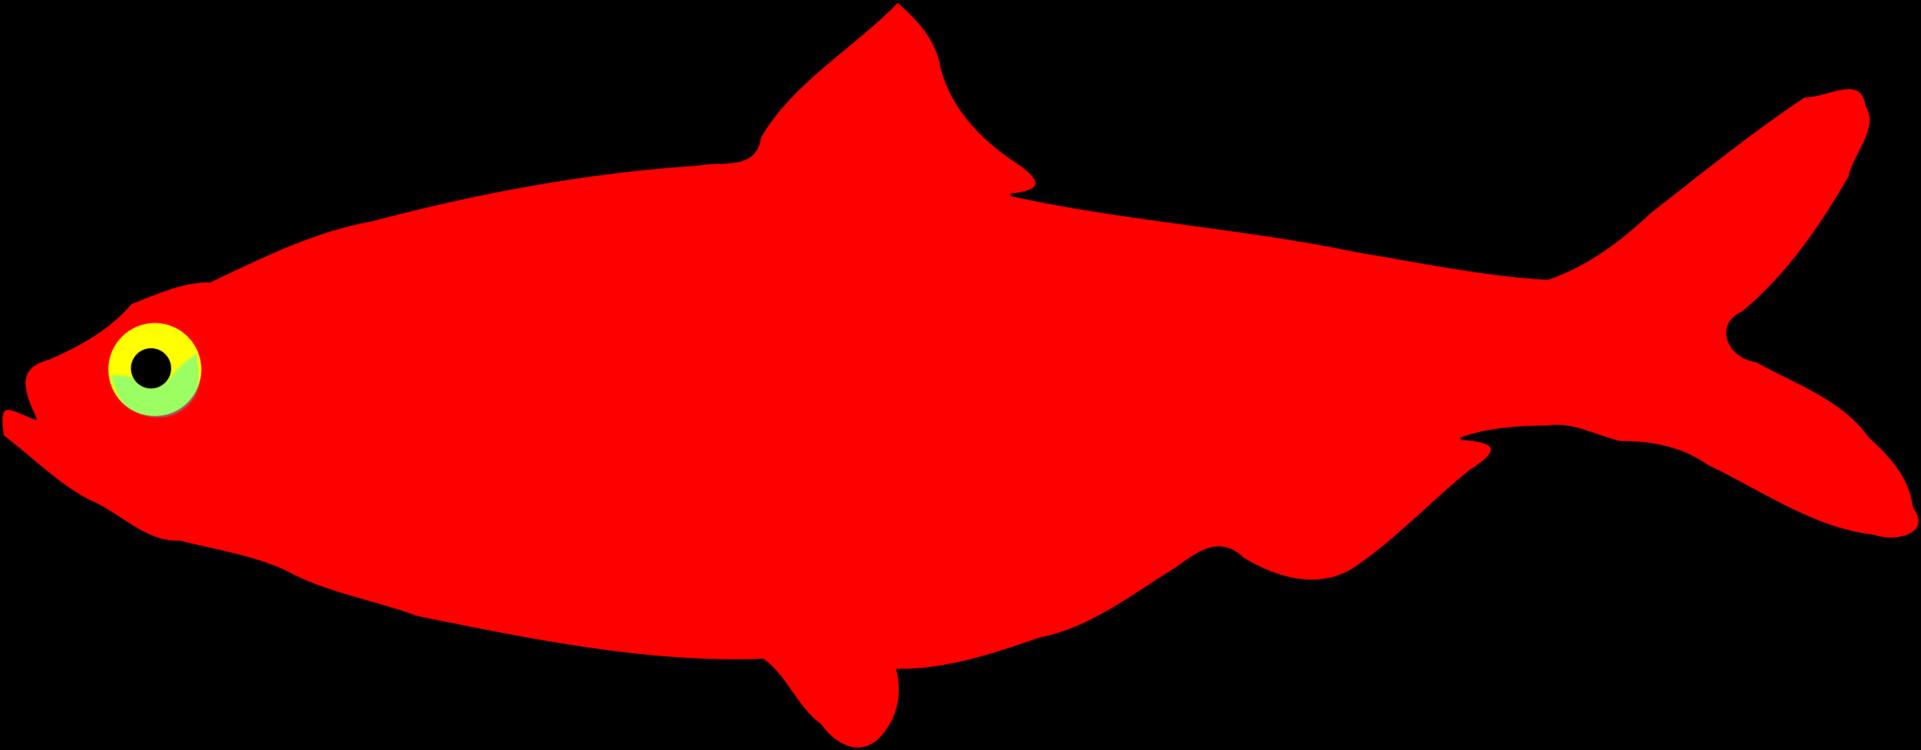 Marine Biology,Fish,Artwork